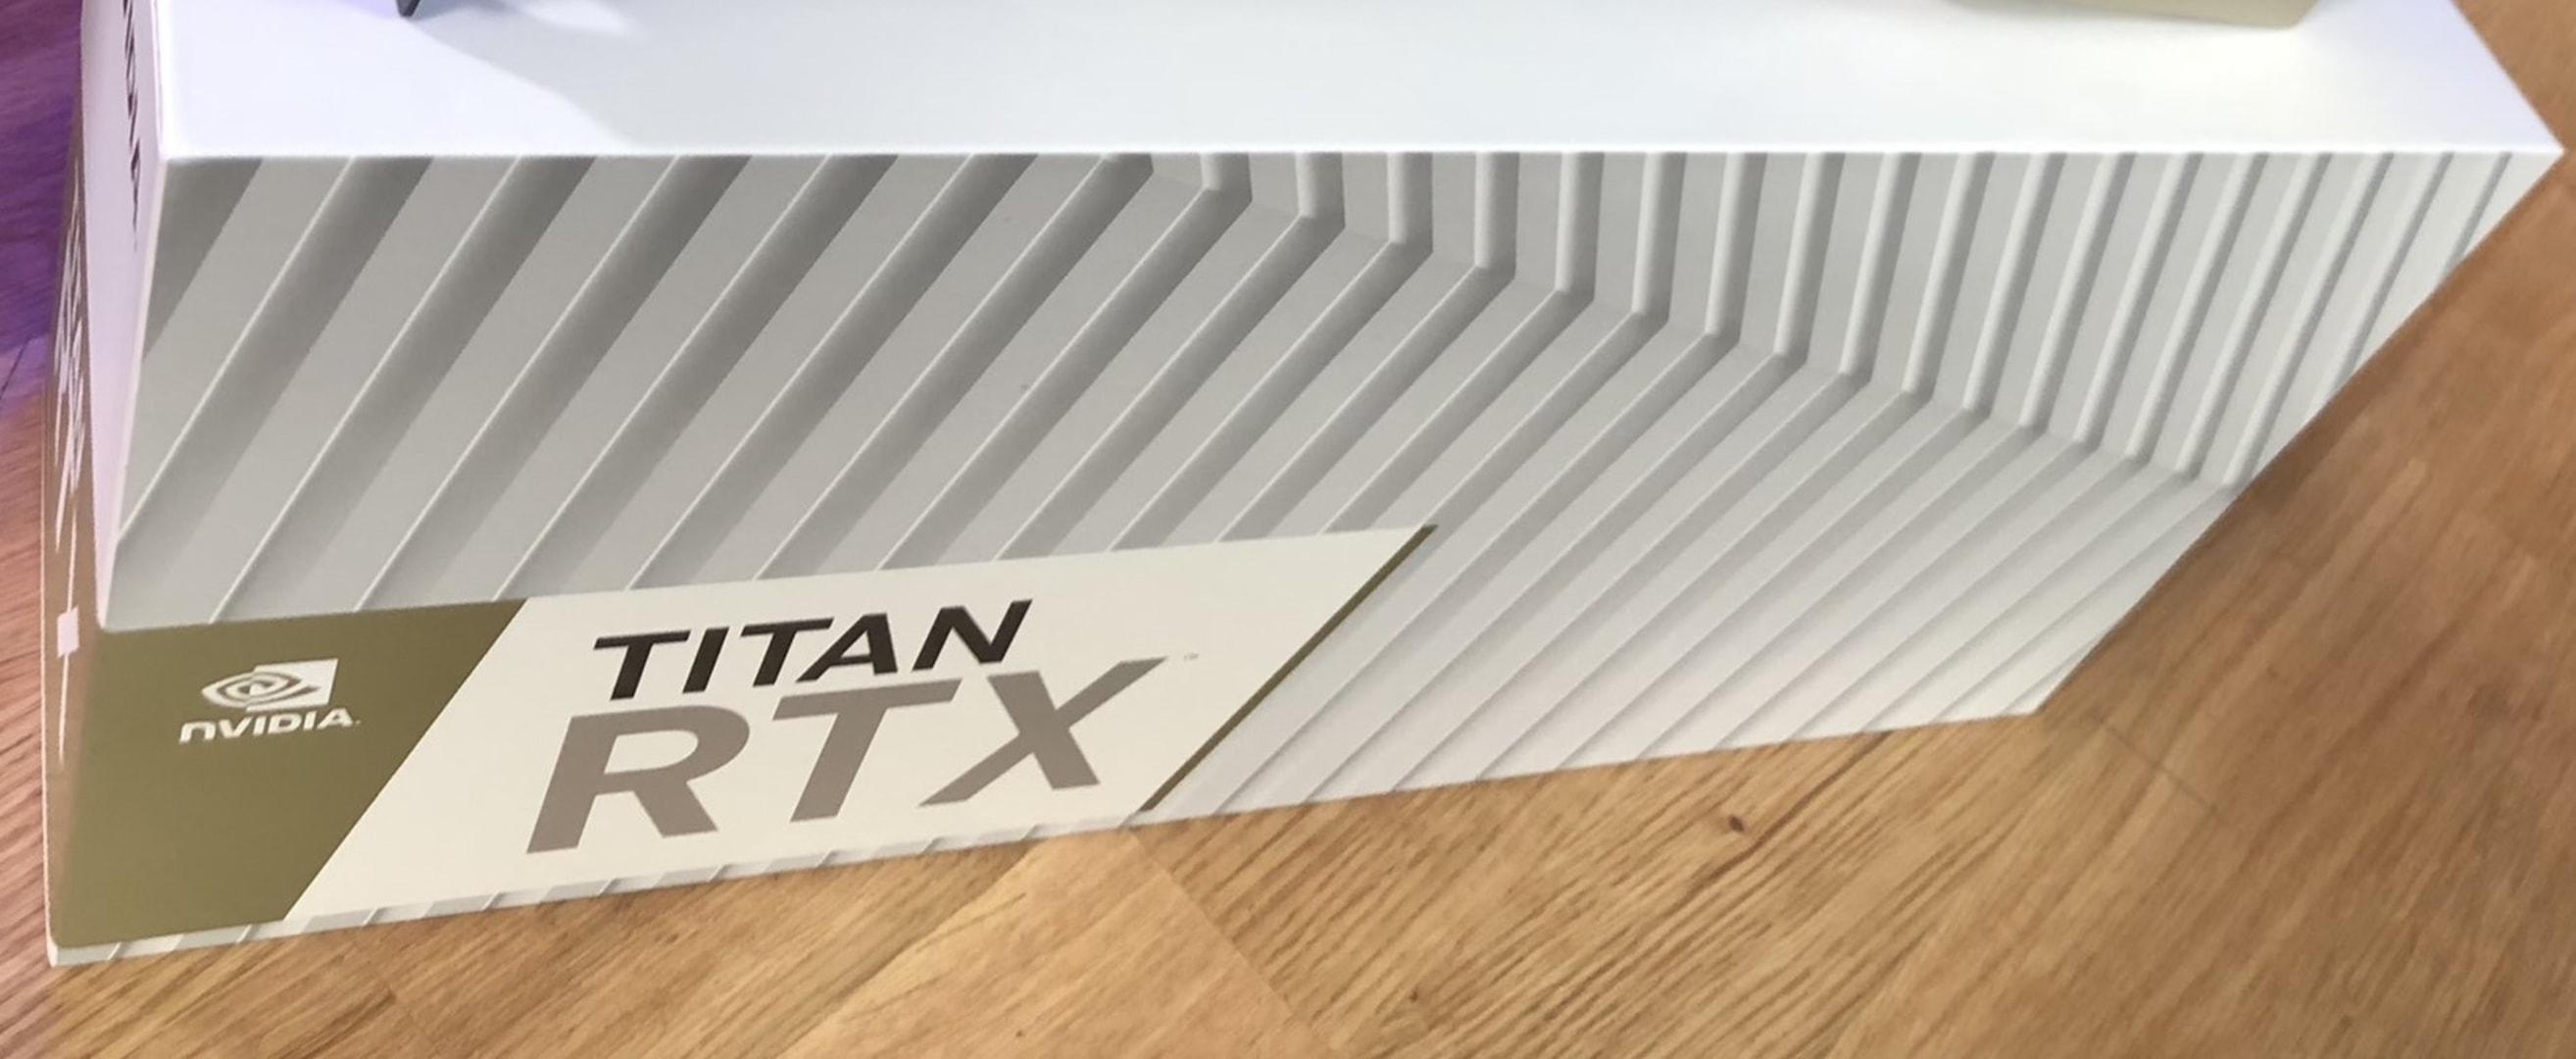 RTX TITAN NVIDIA TURING